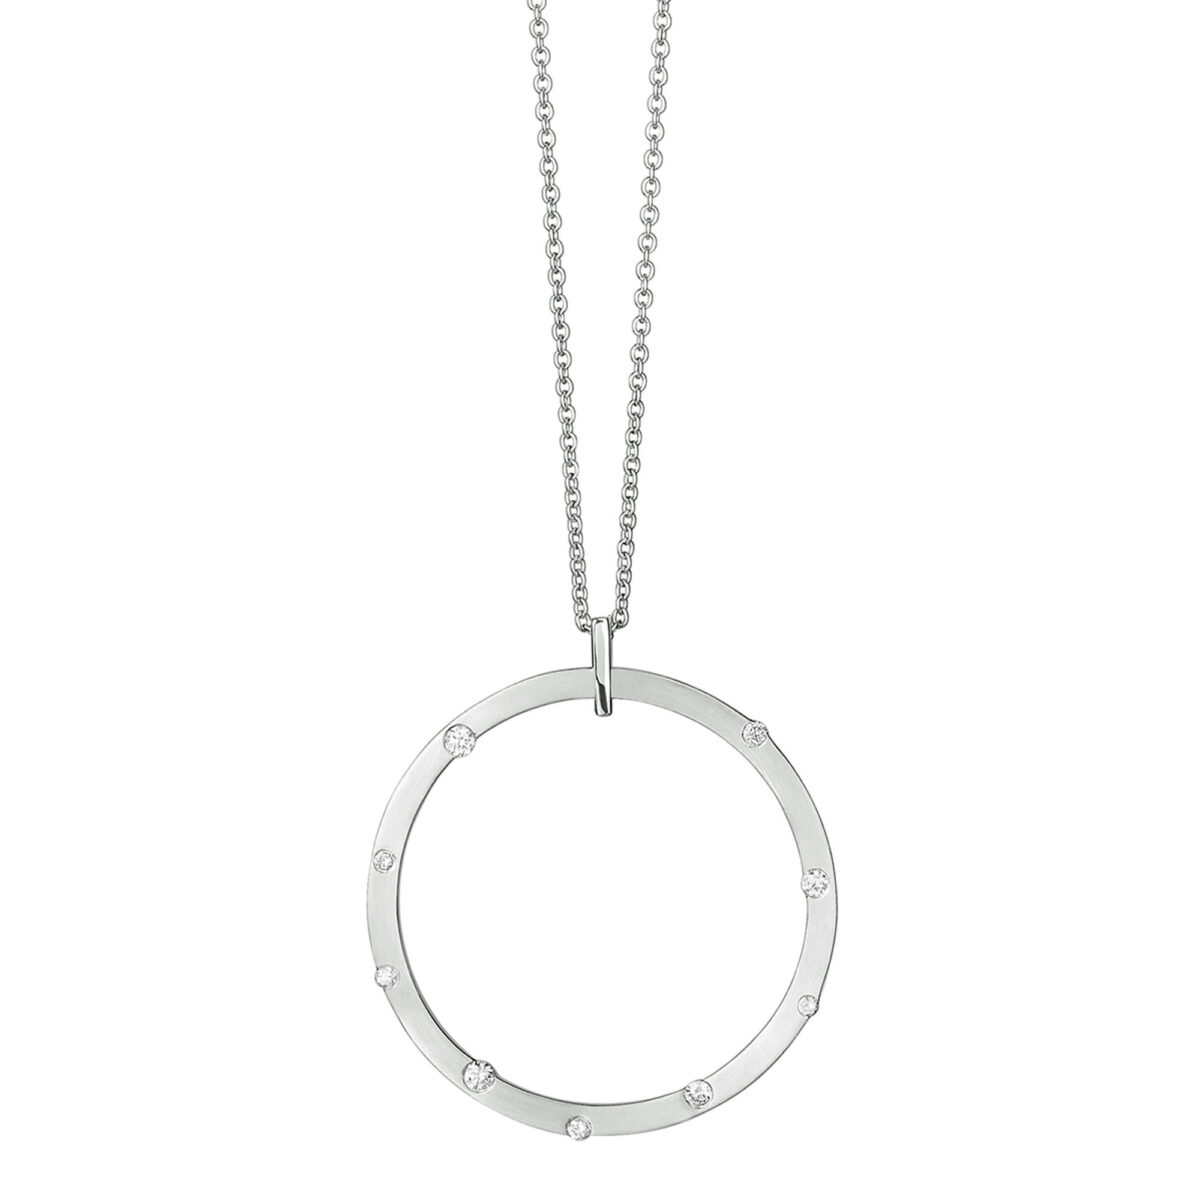 product/c/l/cloud-nine-large-silver-necklace-1.jpg;;product/c/l/cloud-nine-rose-gold-necklace-3_1.jpg;;product/d/m/dmr-packaging_61.jpg